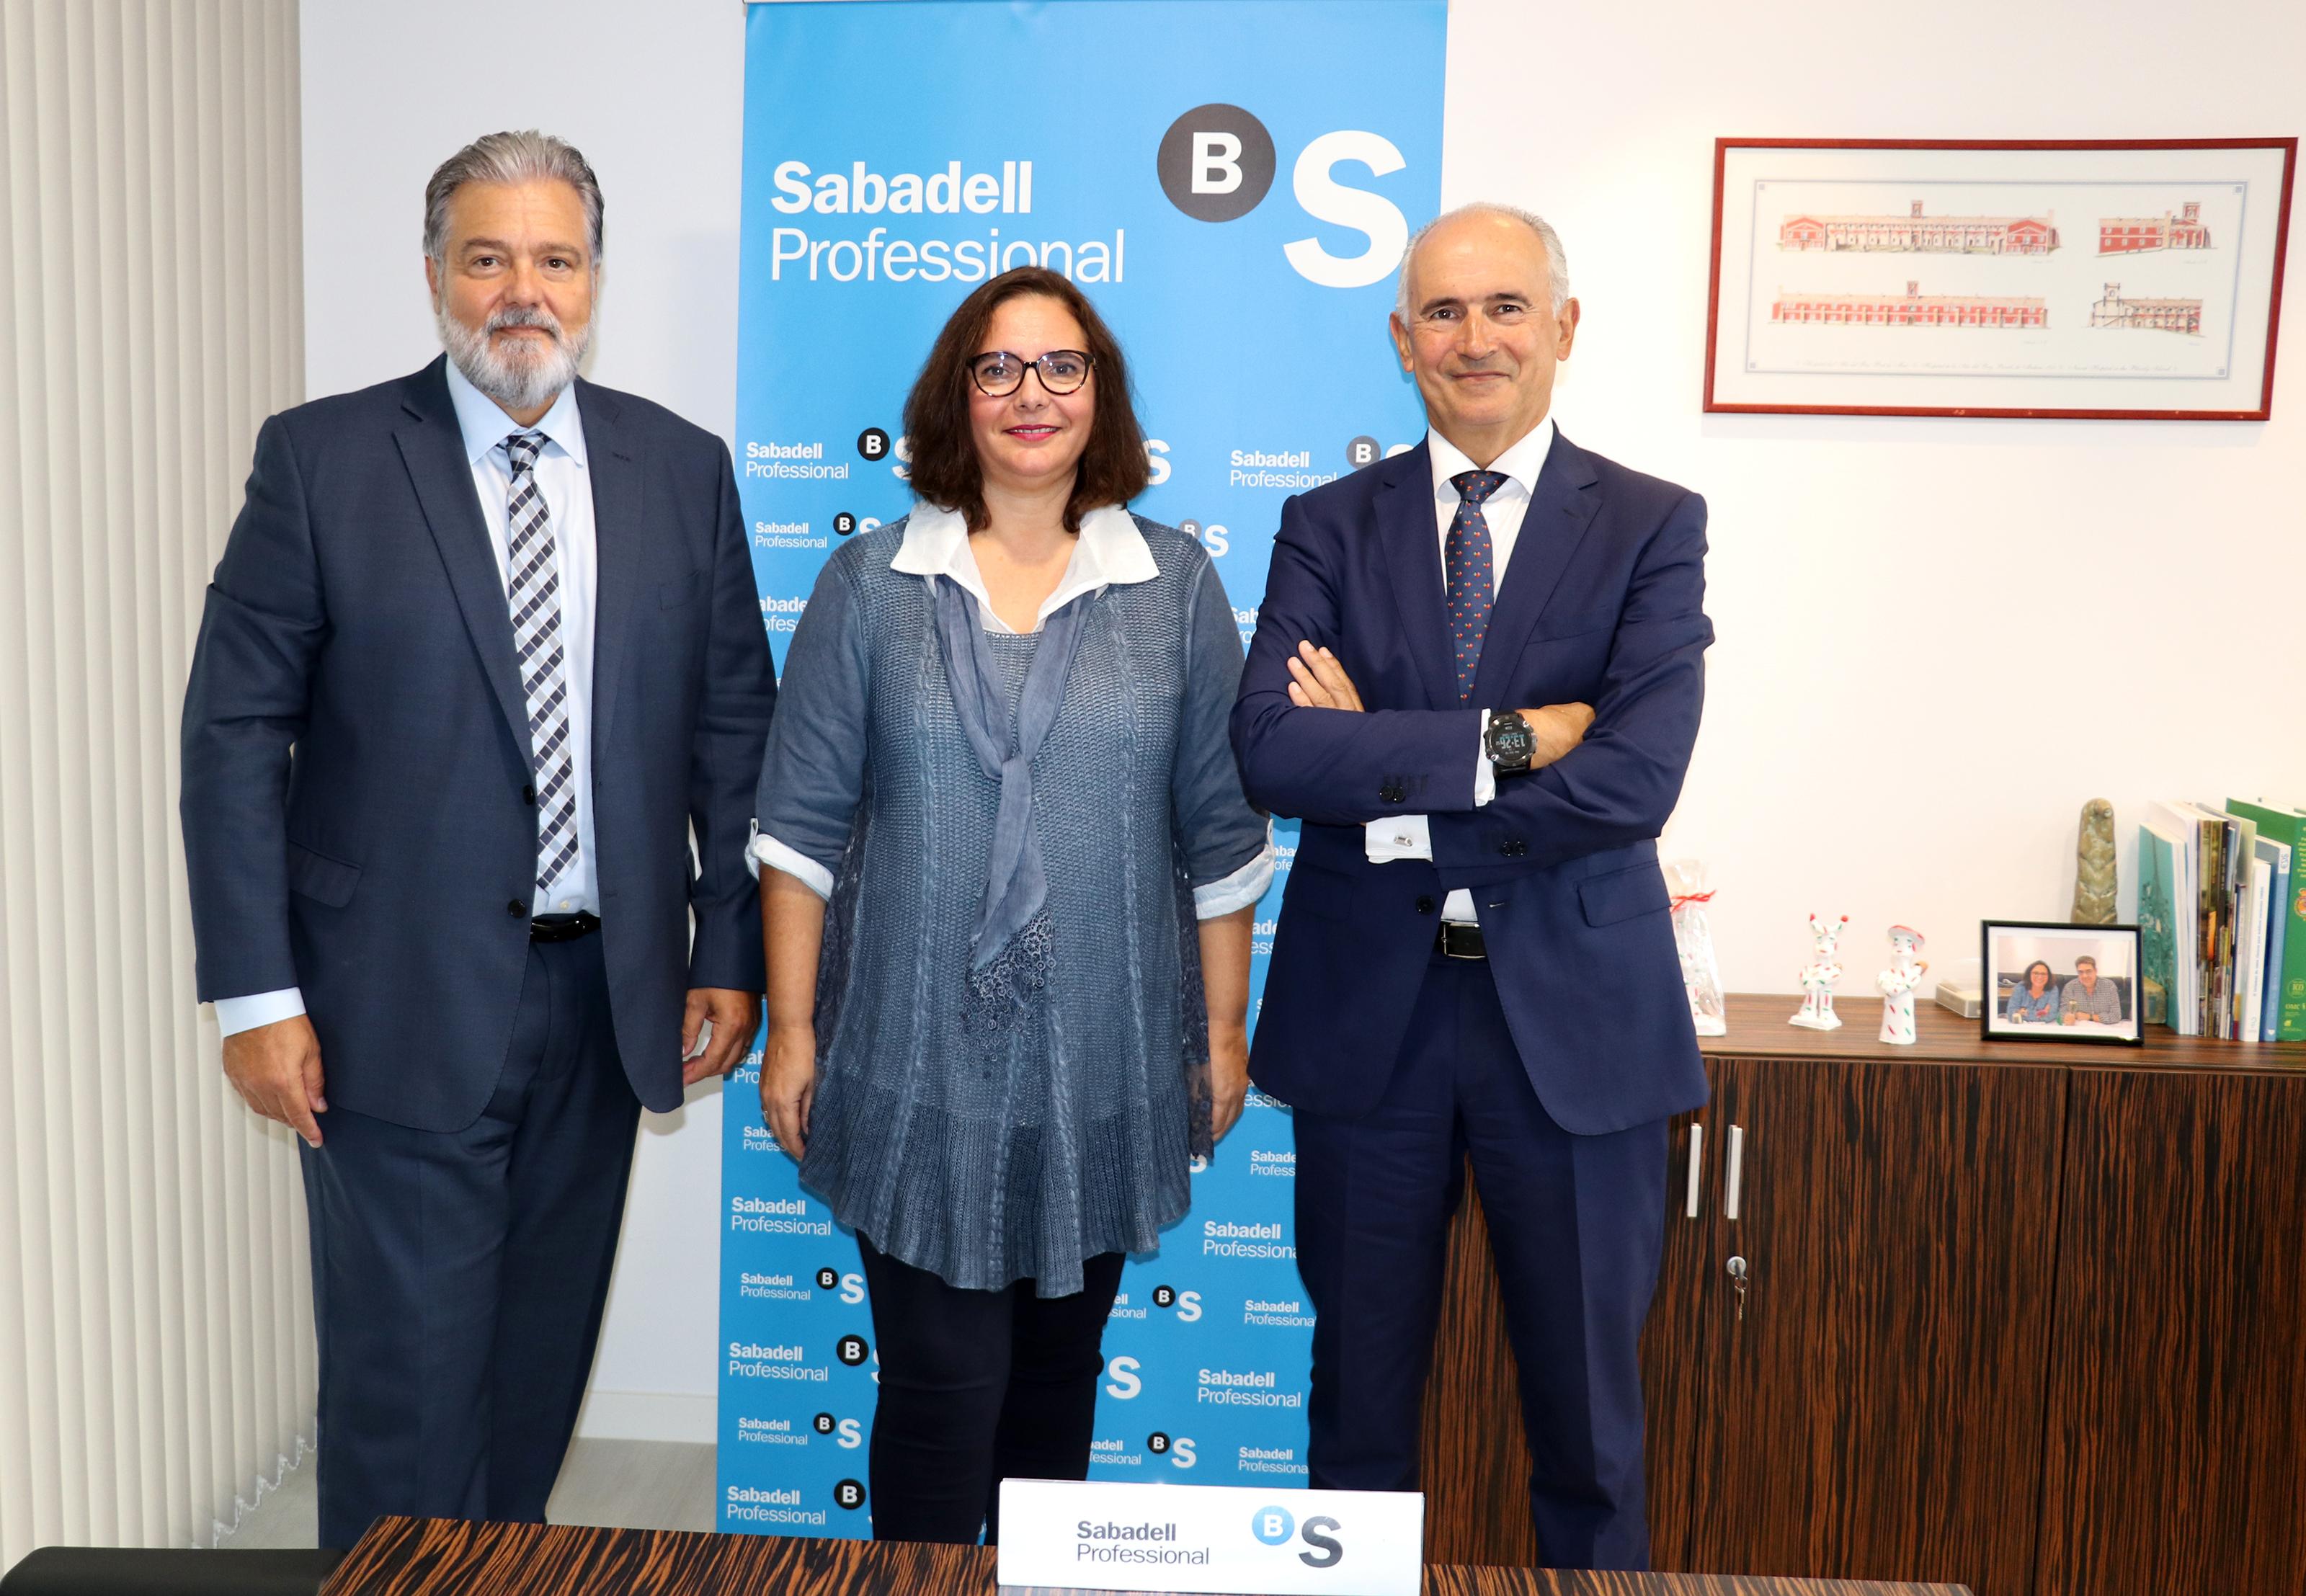 Pedro Ballester, Manuela García y Jaime Matas Vallverdú